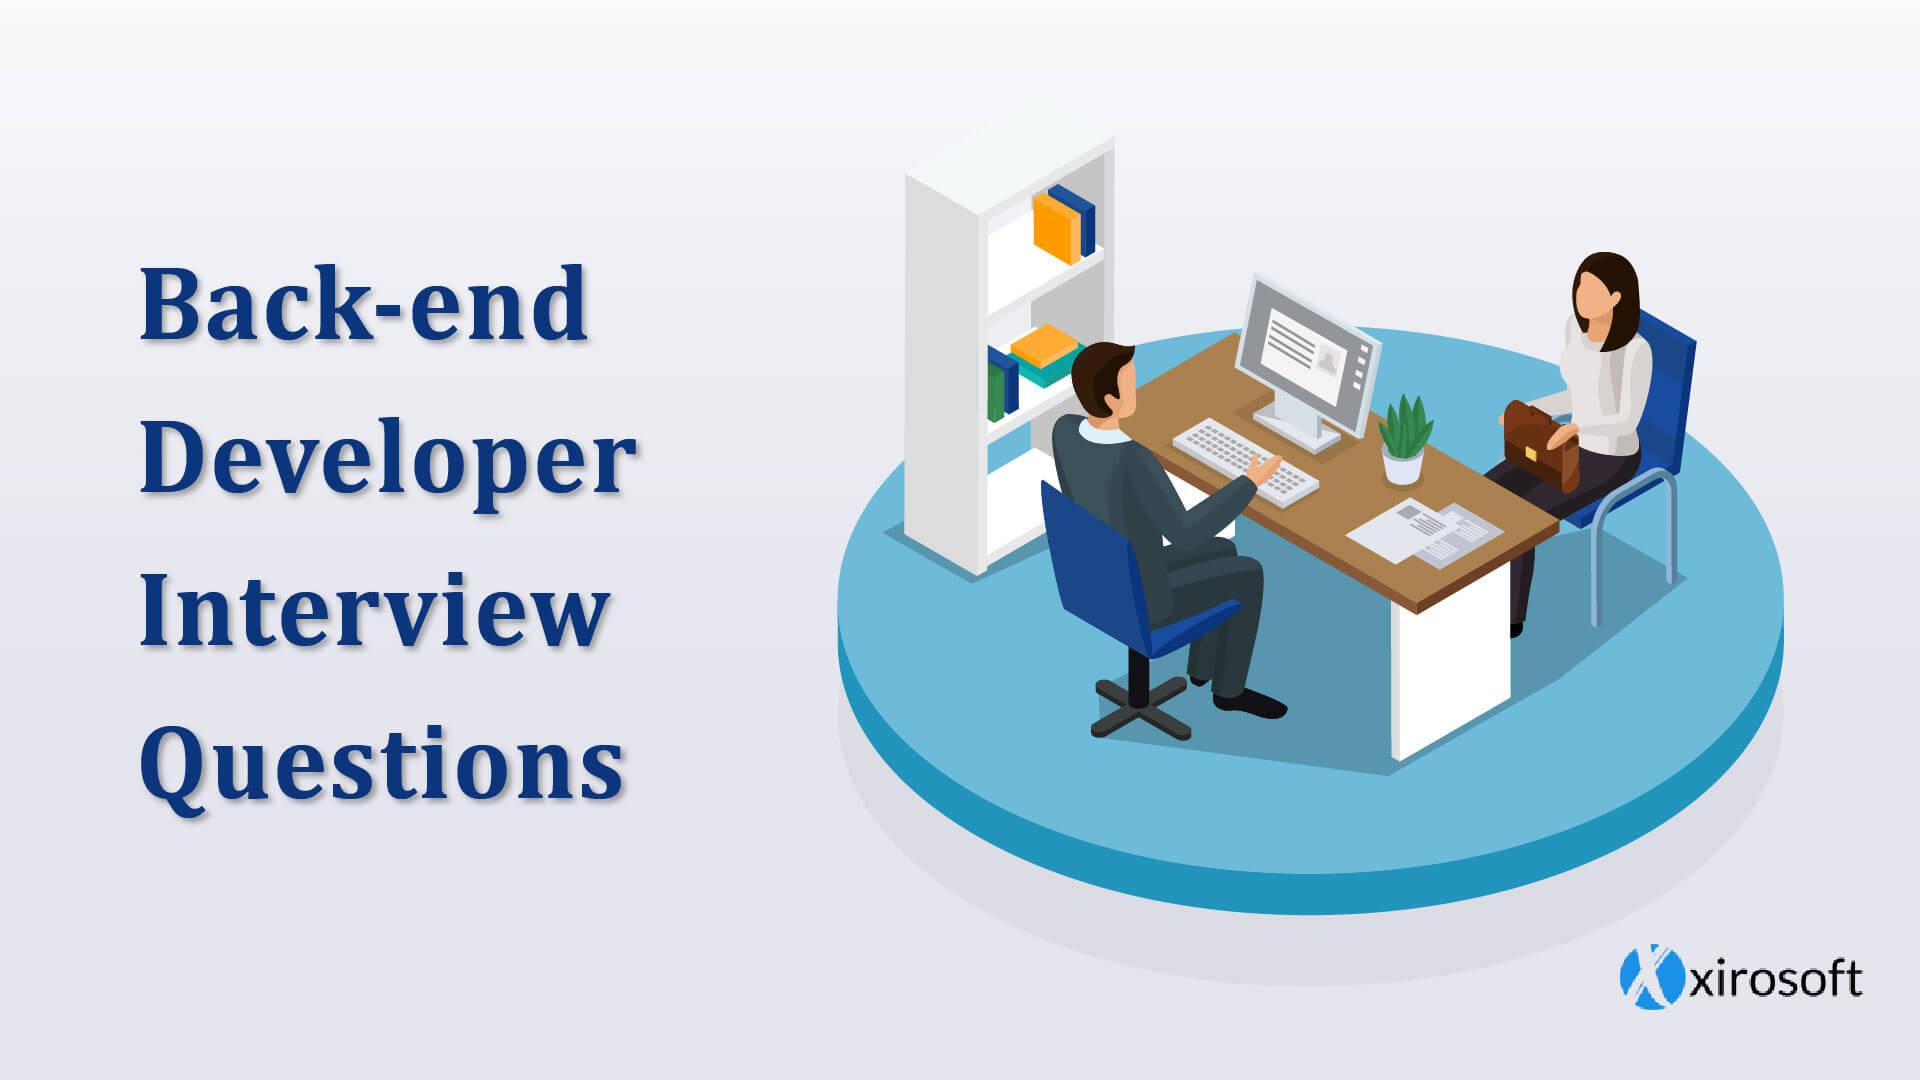 Web Developer Interview Questions Banner Design